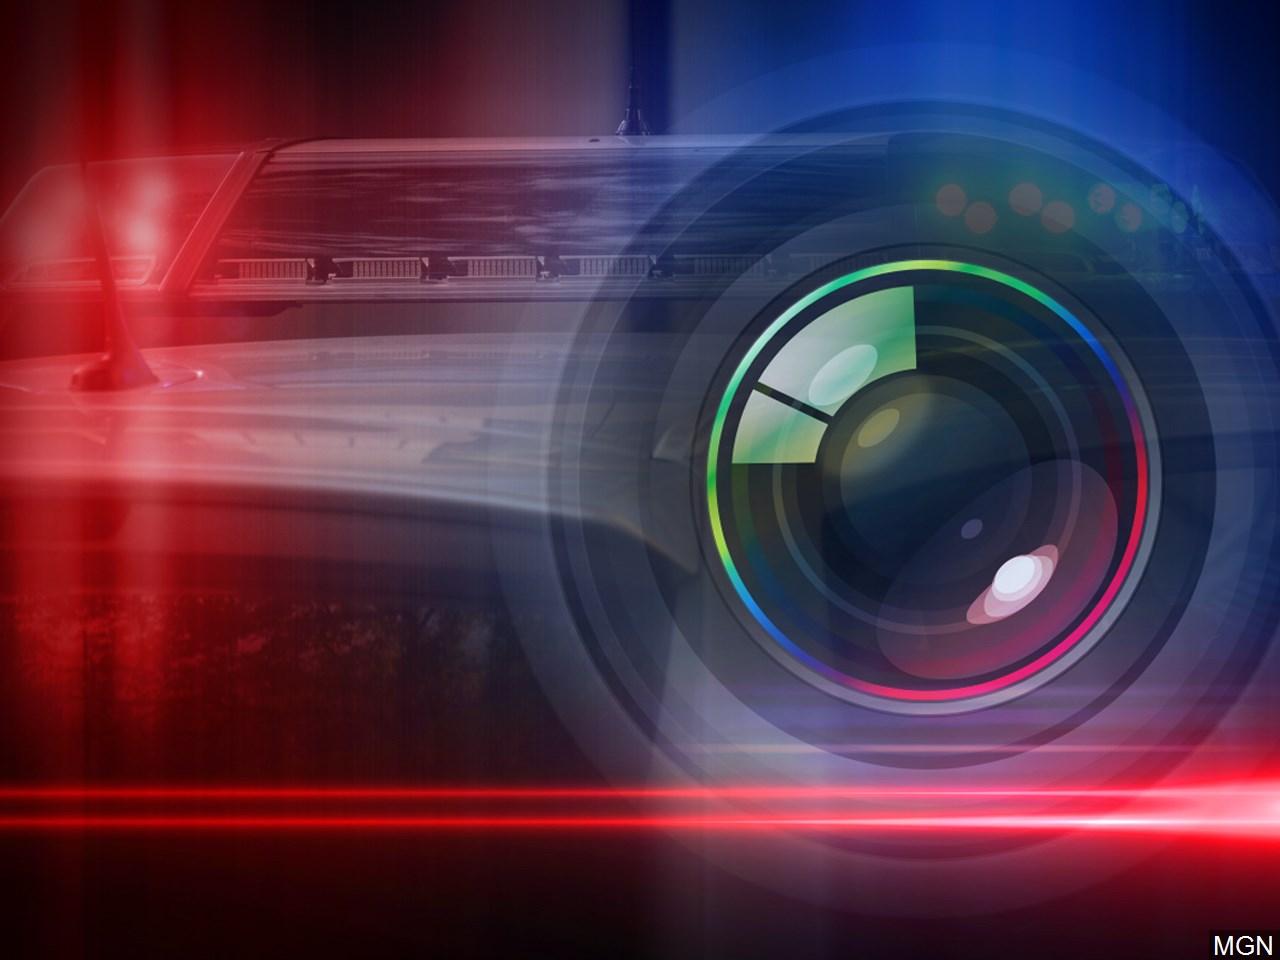 Hidden Camera Found In Women's Bathroom At Sallisaw Restaurant, Man Arrested thumbnail